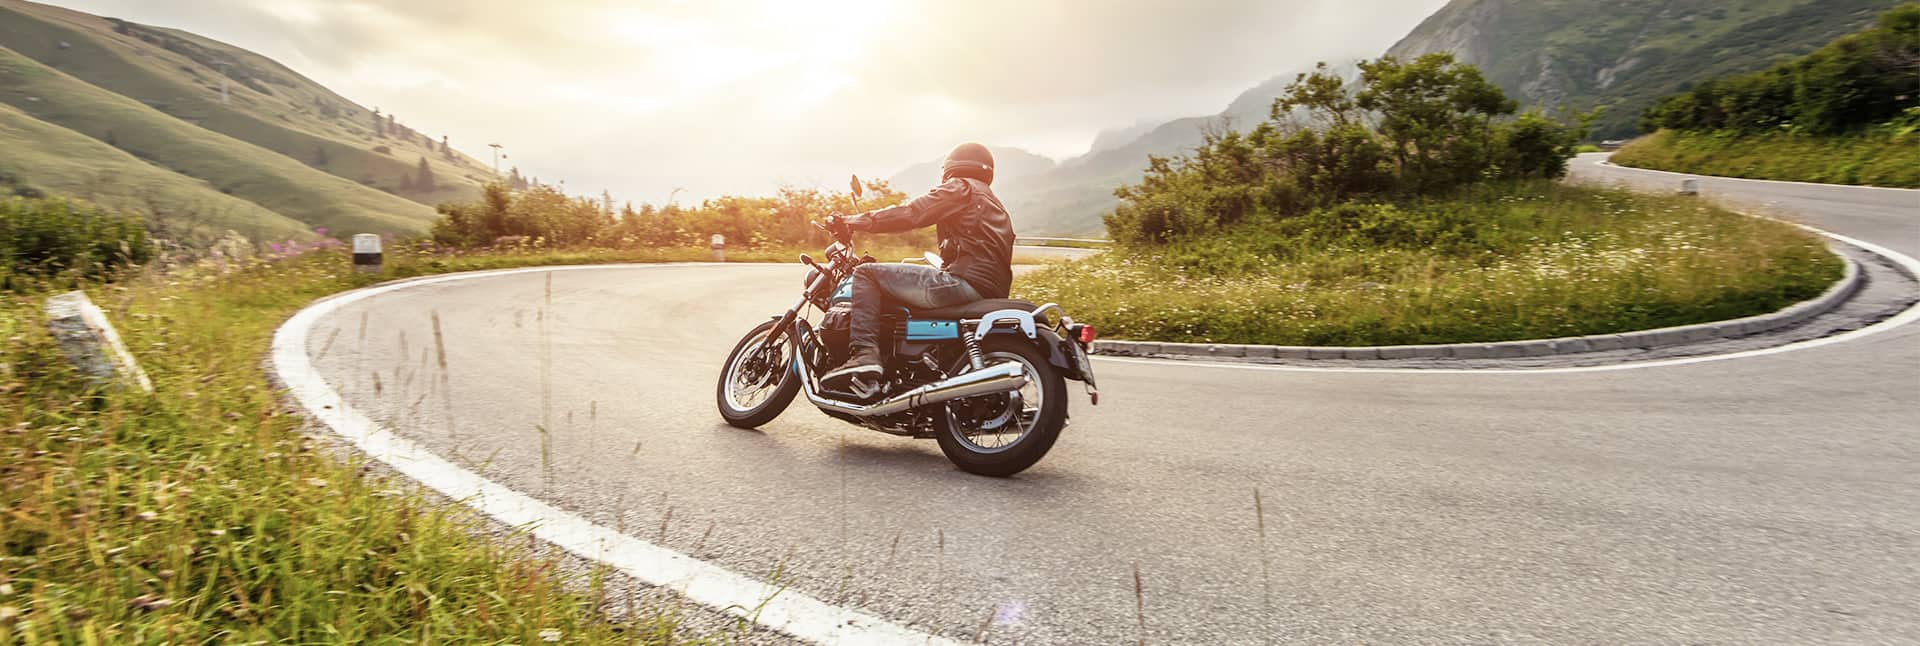 Starco insurance motorcycle insurance header